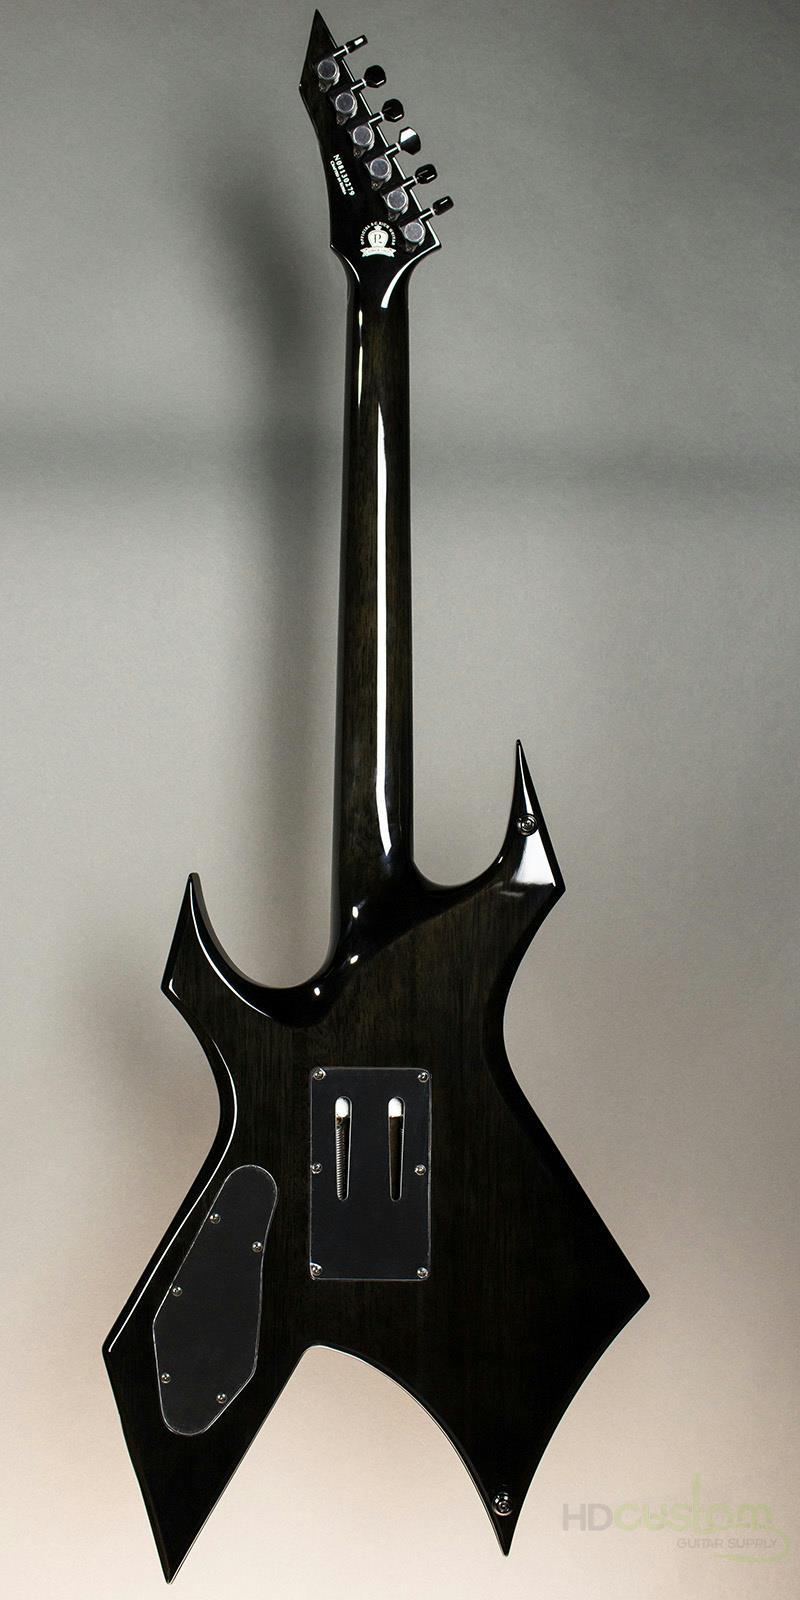 Wiring Diagram For Bc Rich Guitar Bronze - Wiring Diagram •